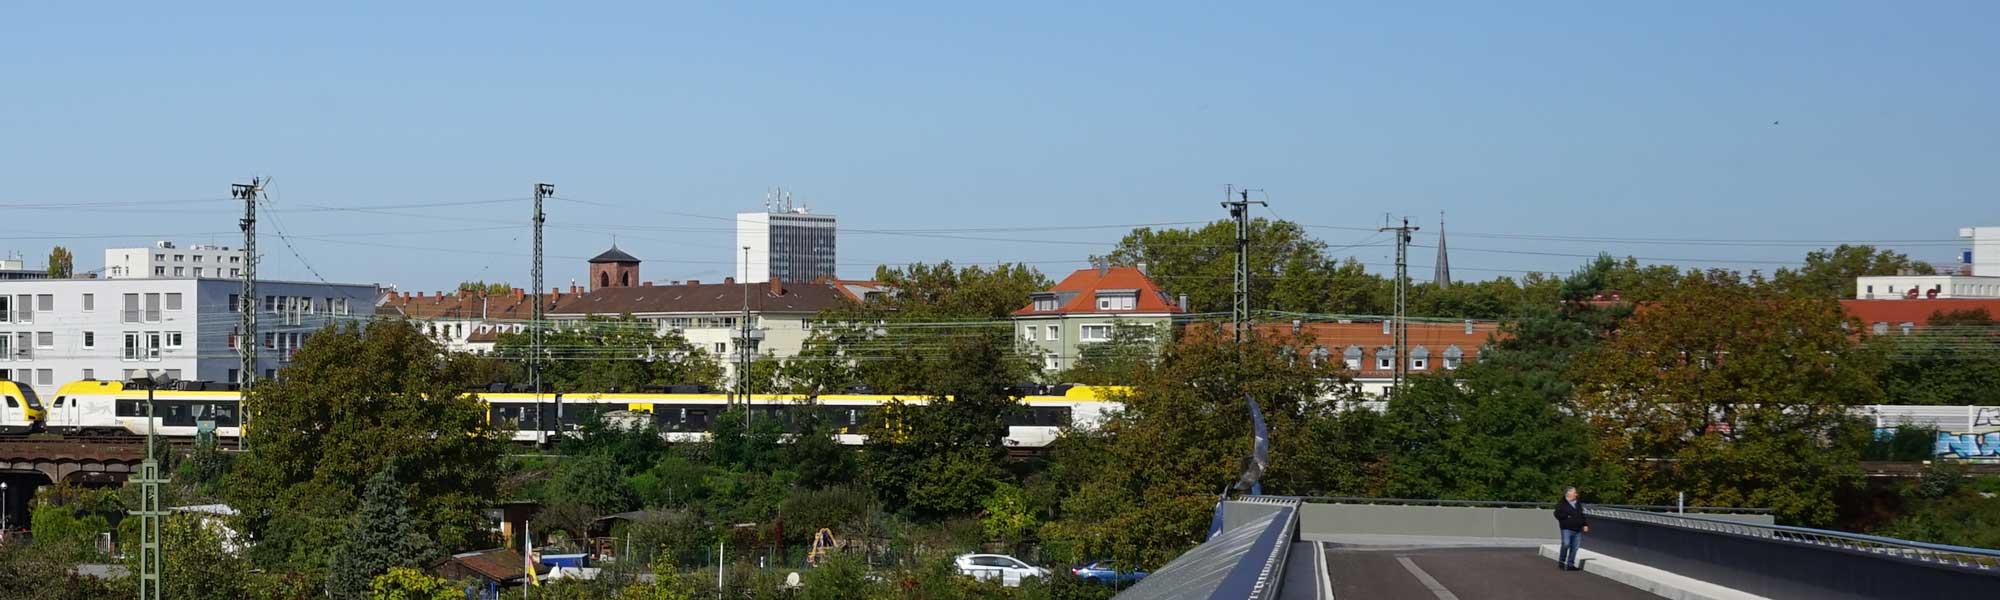 Suedstadt_Baustelle07387